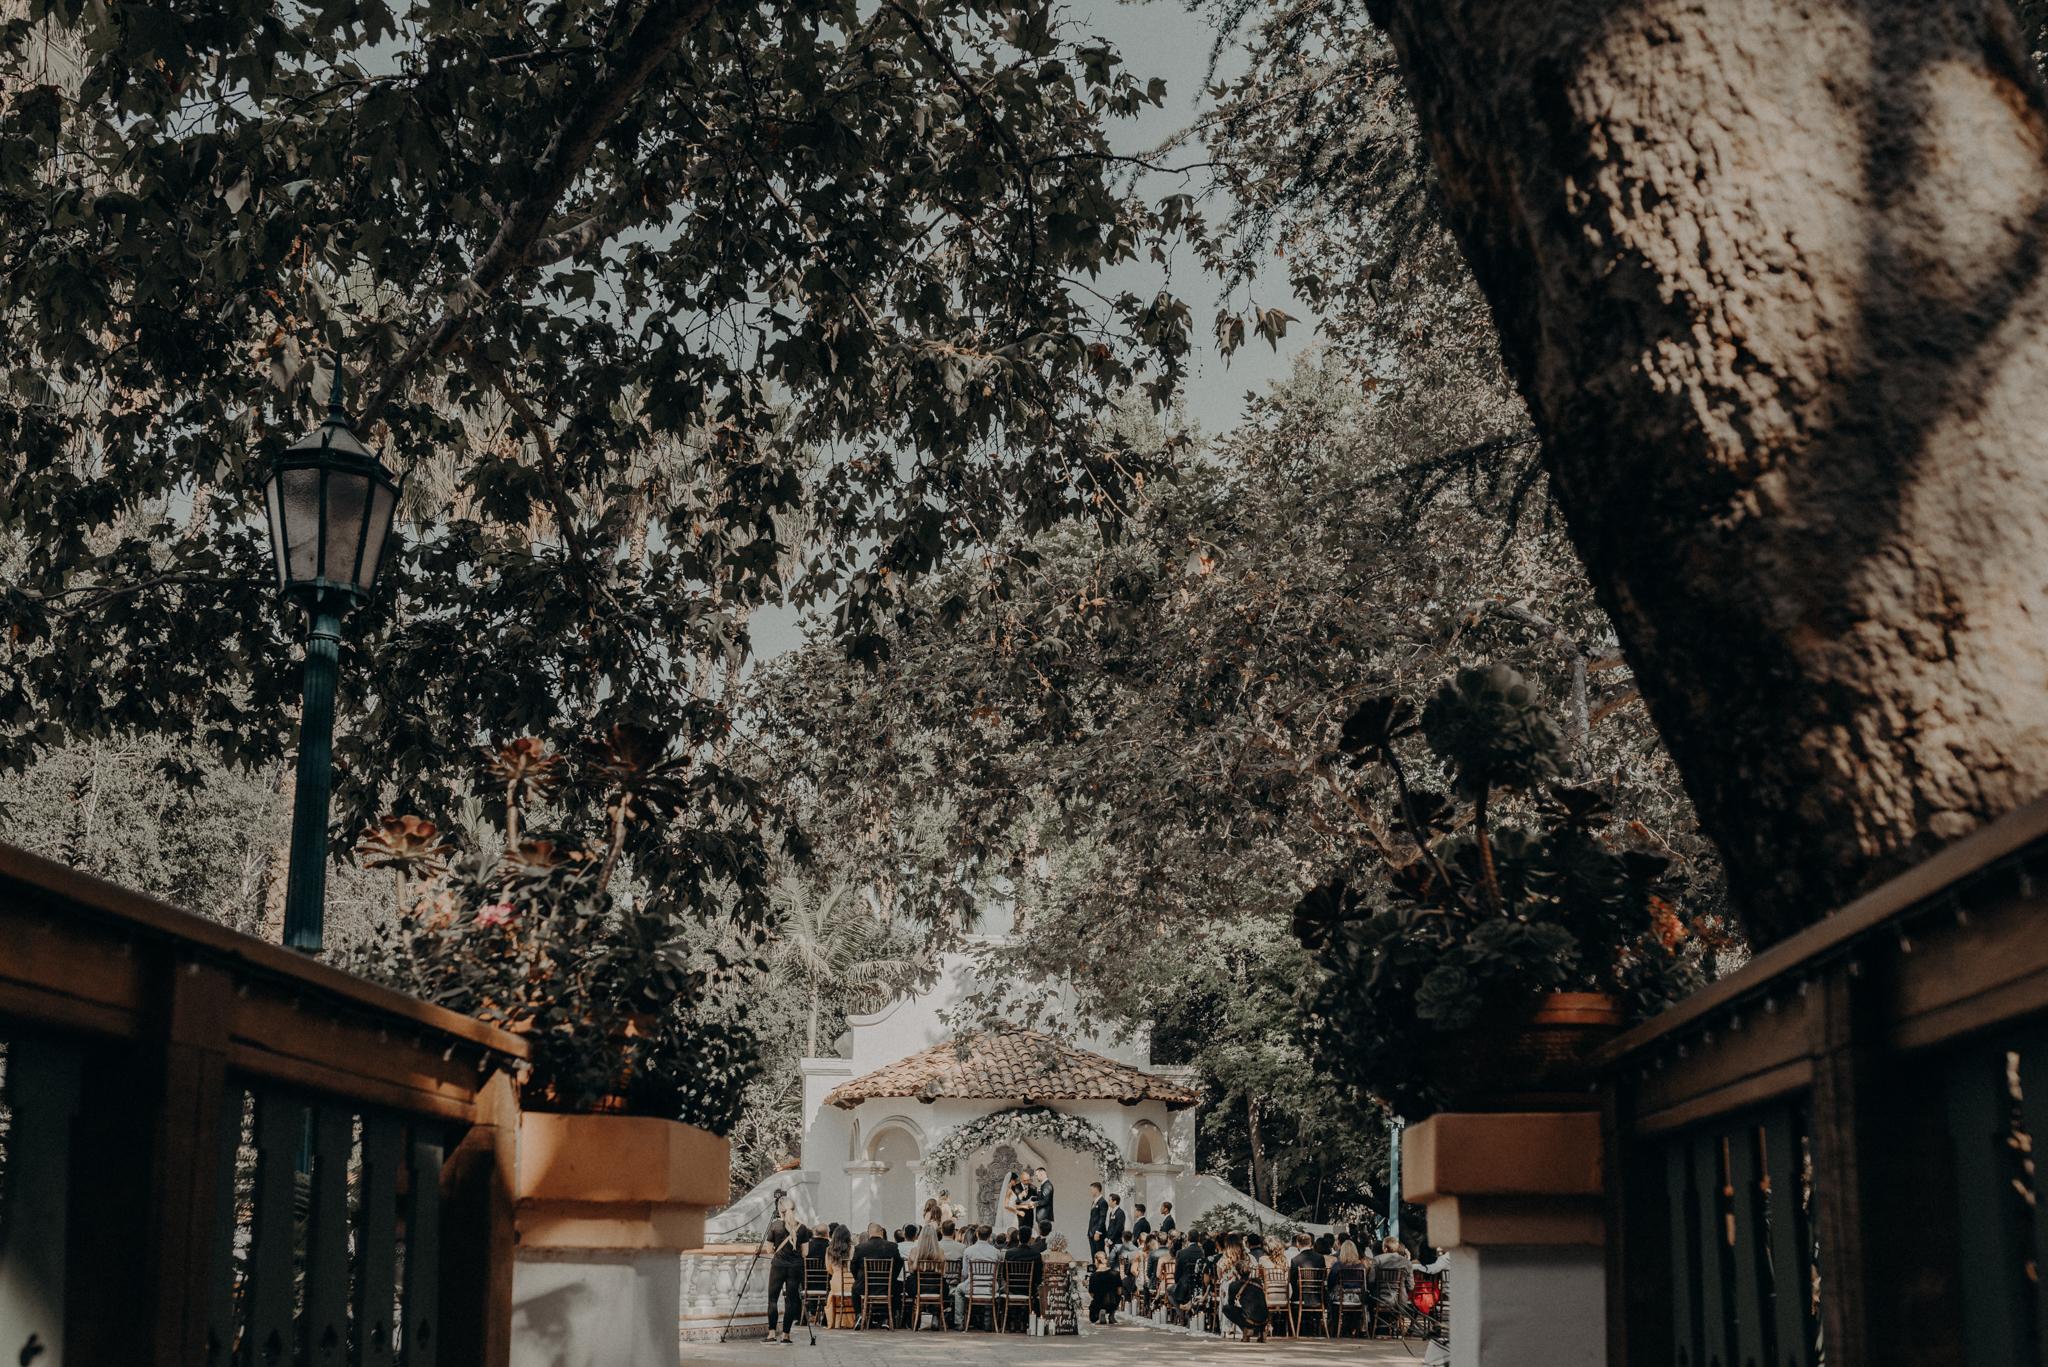 Isaiah + Taylor Photography - Rancho Las Lomas Wedding, Los Angeles Wedding Photographer-056.jpg